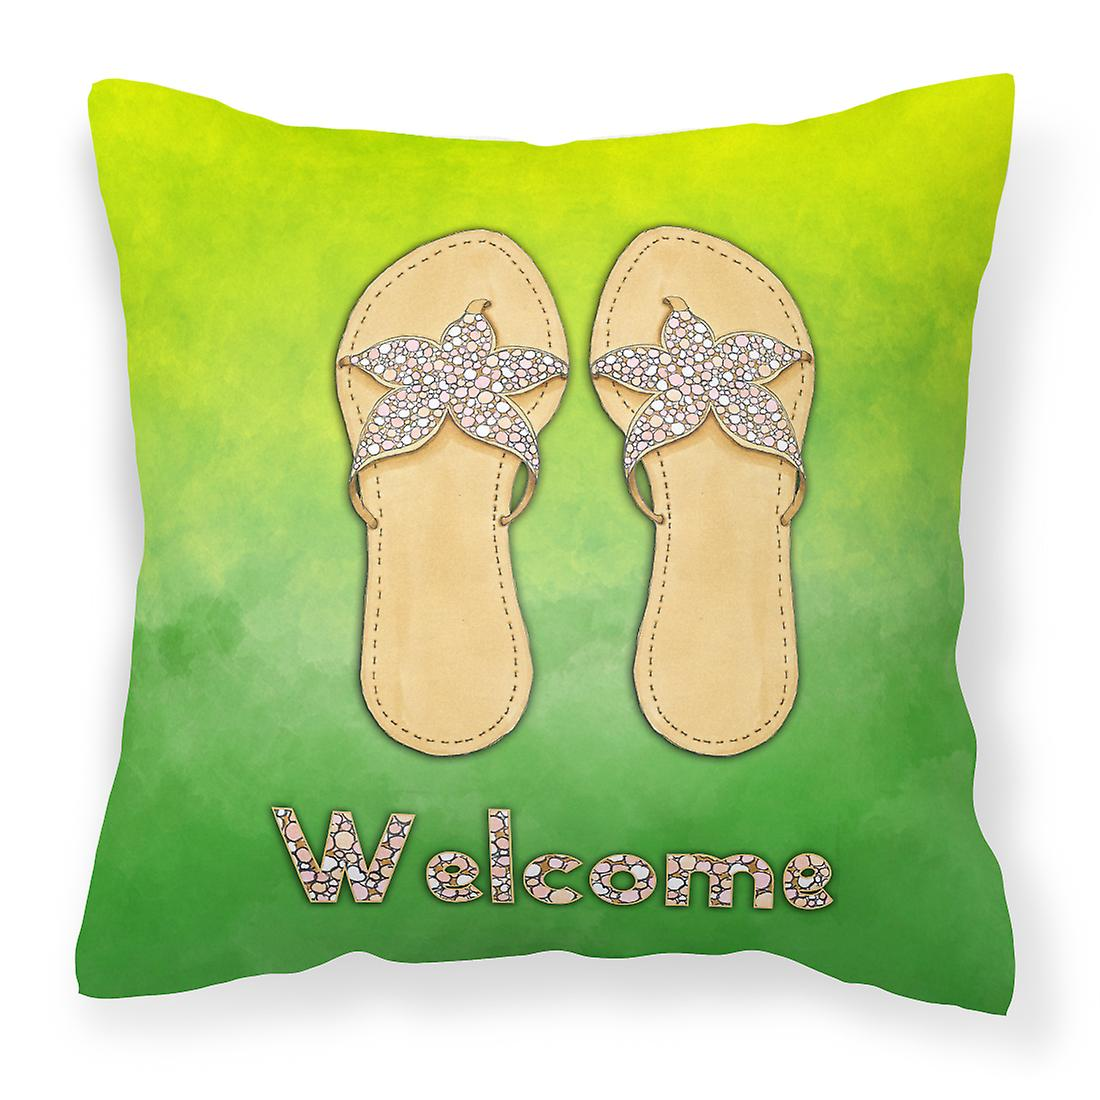 Trésors Bienvenue Oreiller Décoratif Carolines Bb7454pw1818 Flip Flops Tissu tQhrdCs